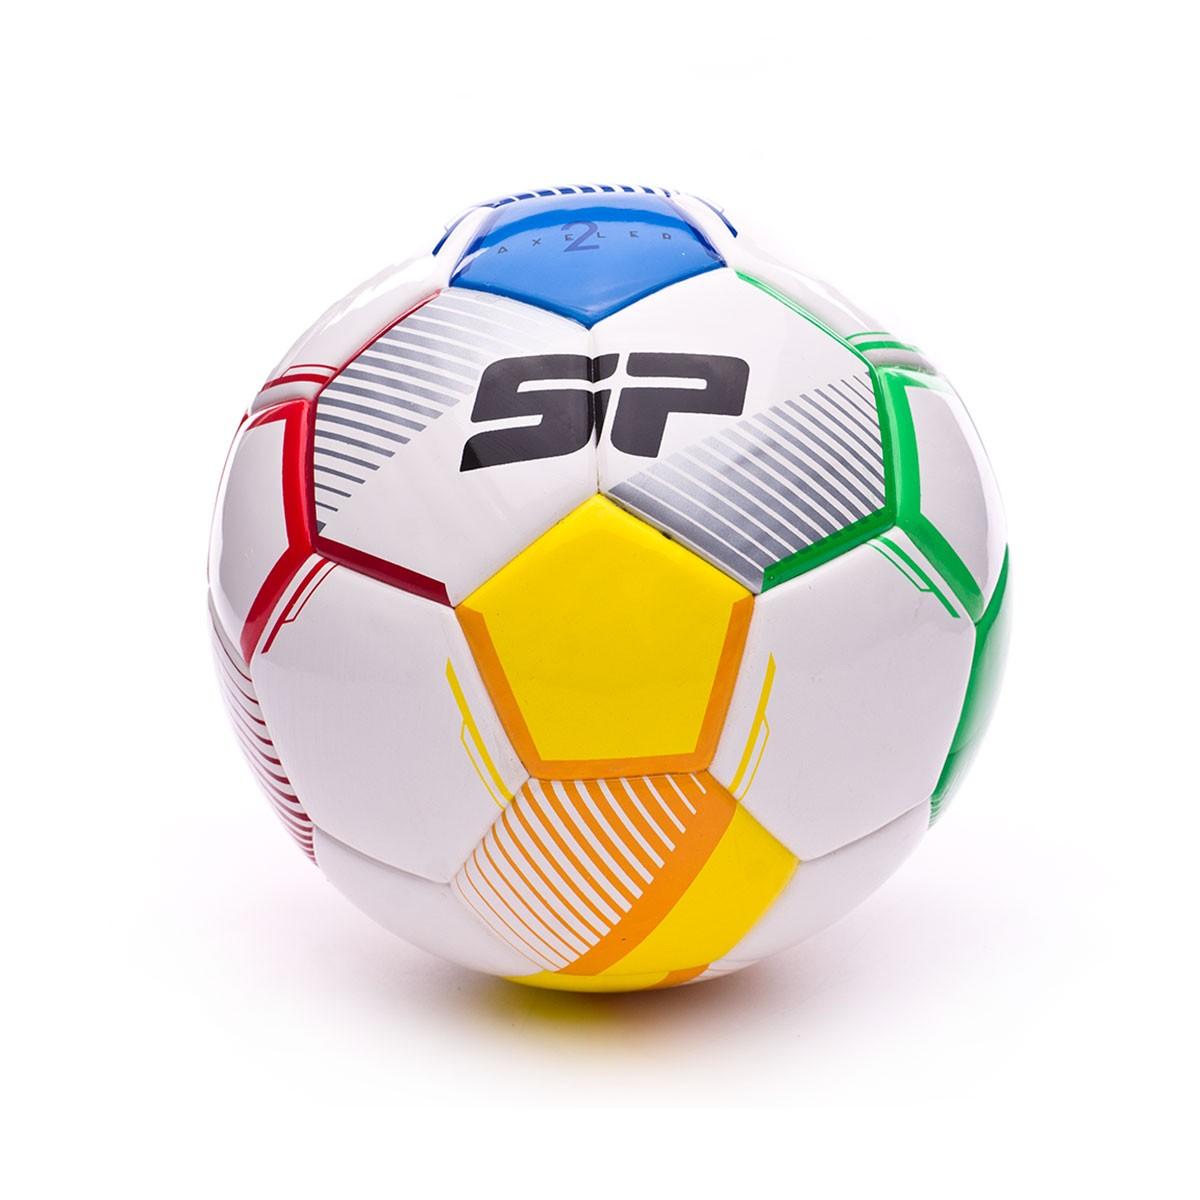 3b84ad8cb23b9 Balones de fútbol sala - Tienda de fútbol Fútbol Emotion